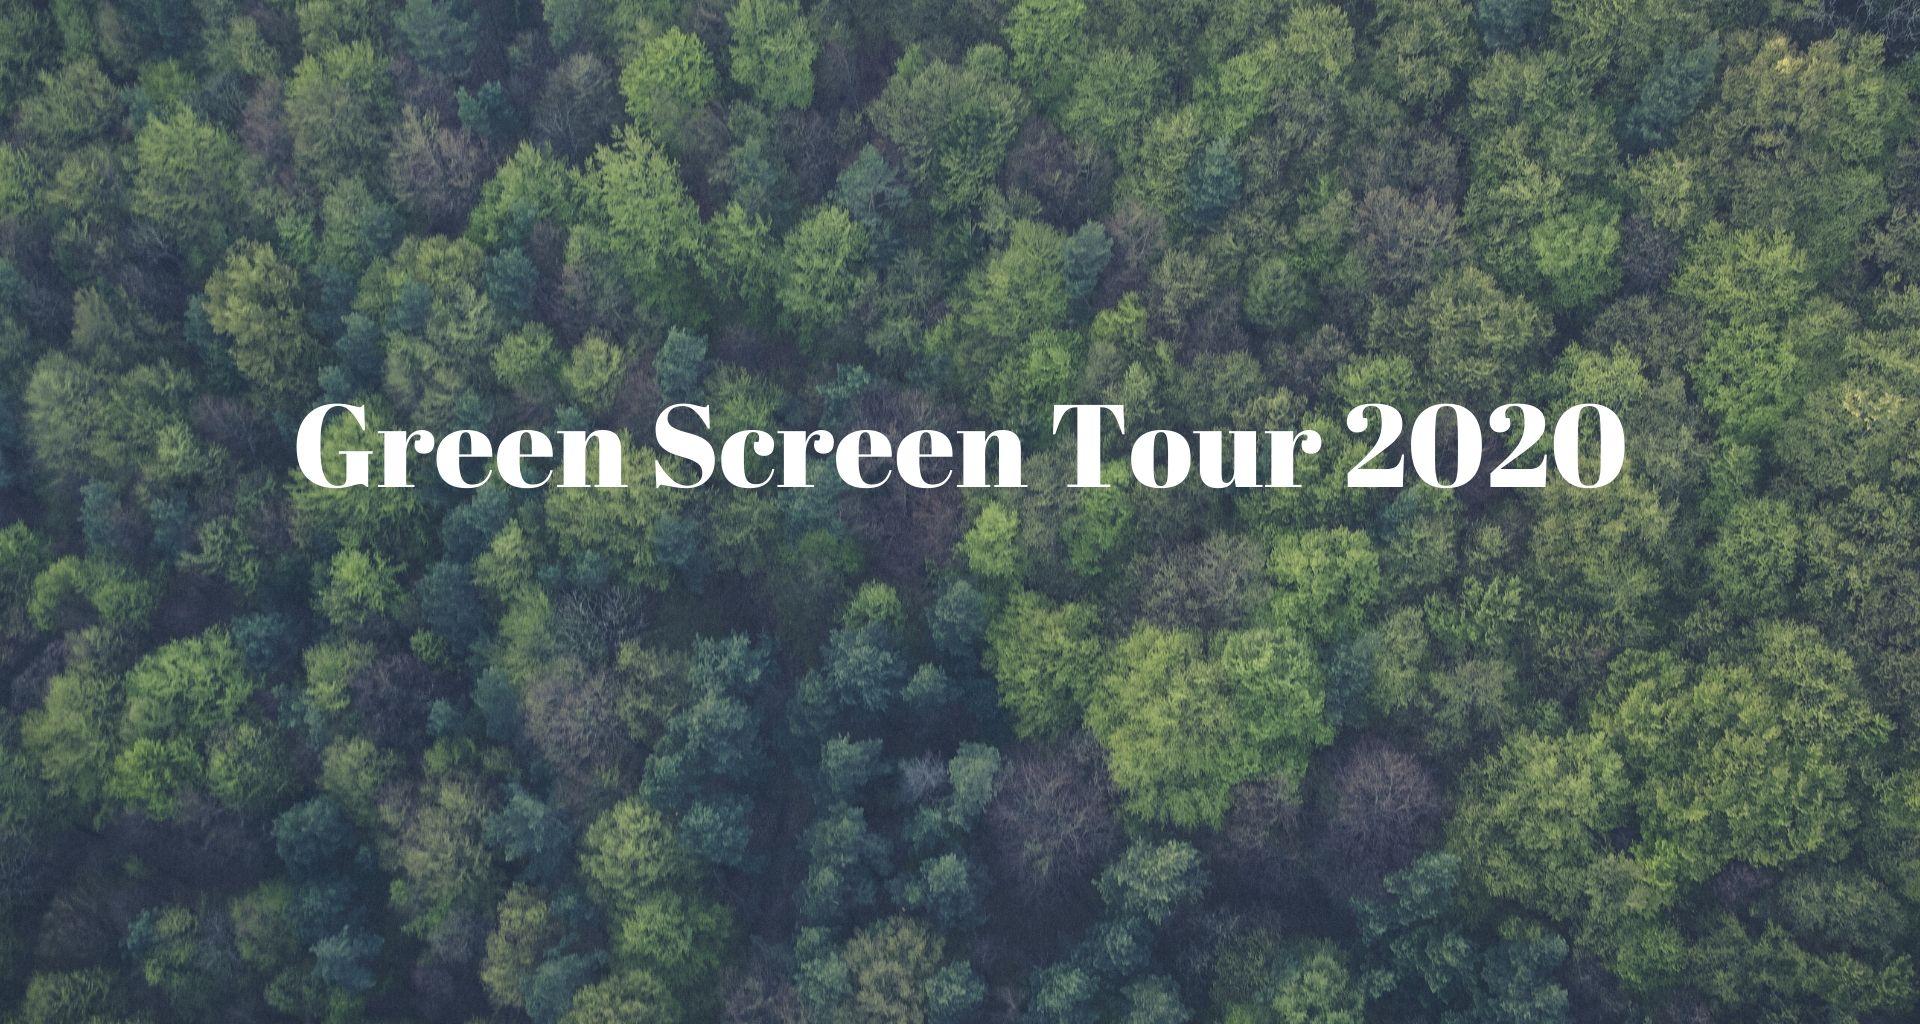 Top Event - Green Screen Tour 2020